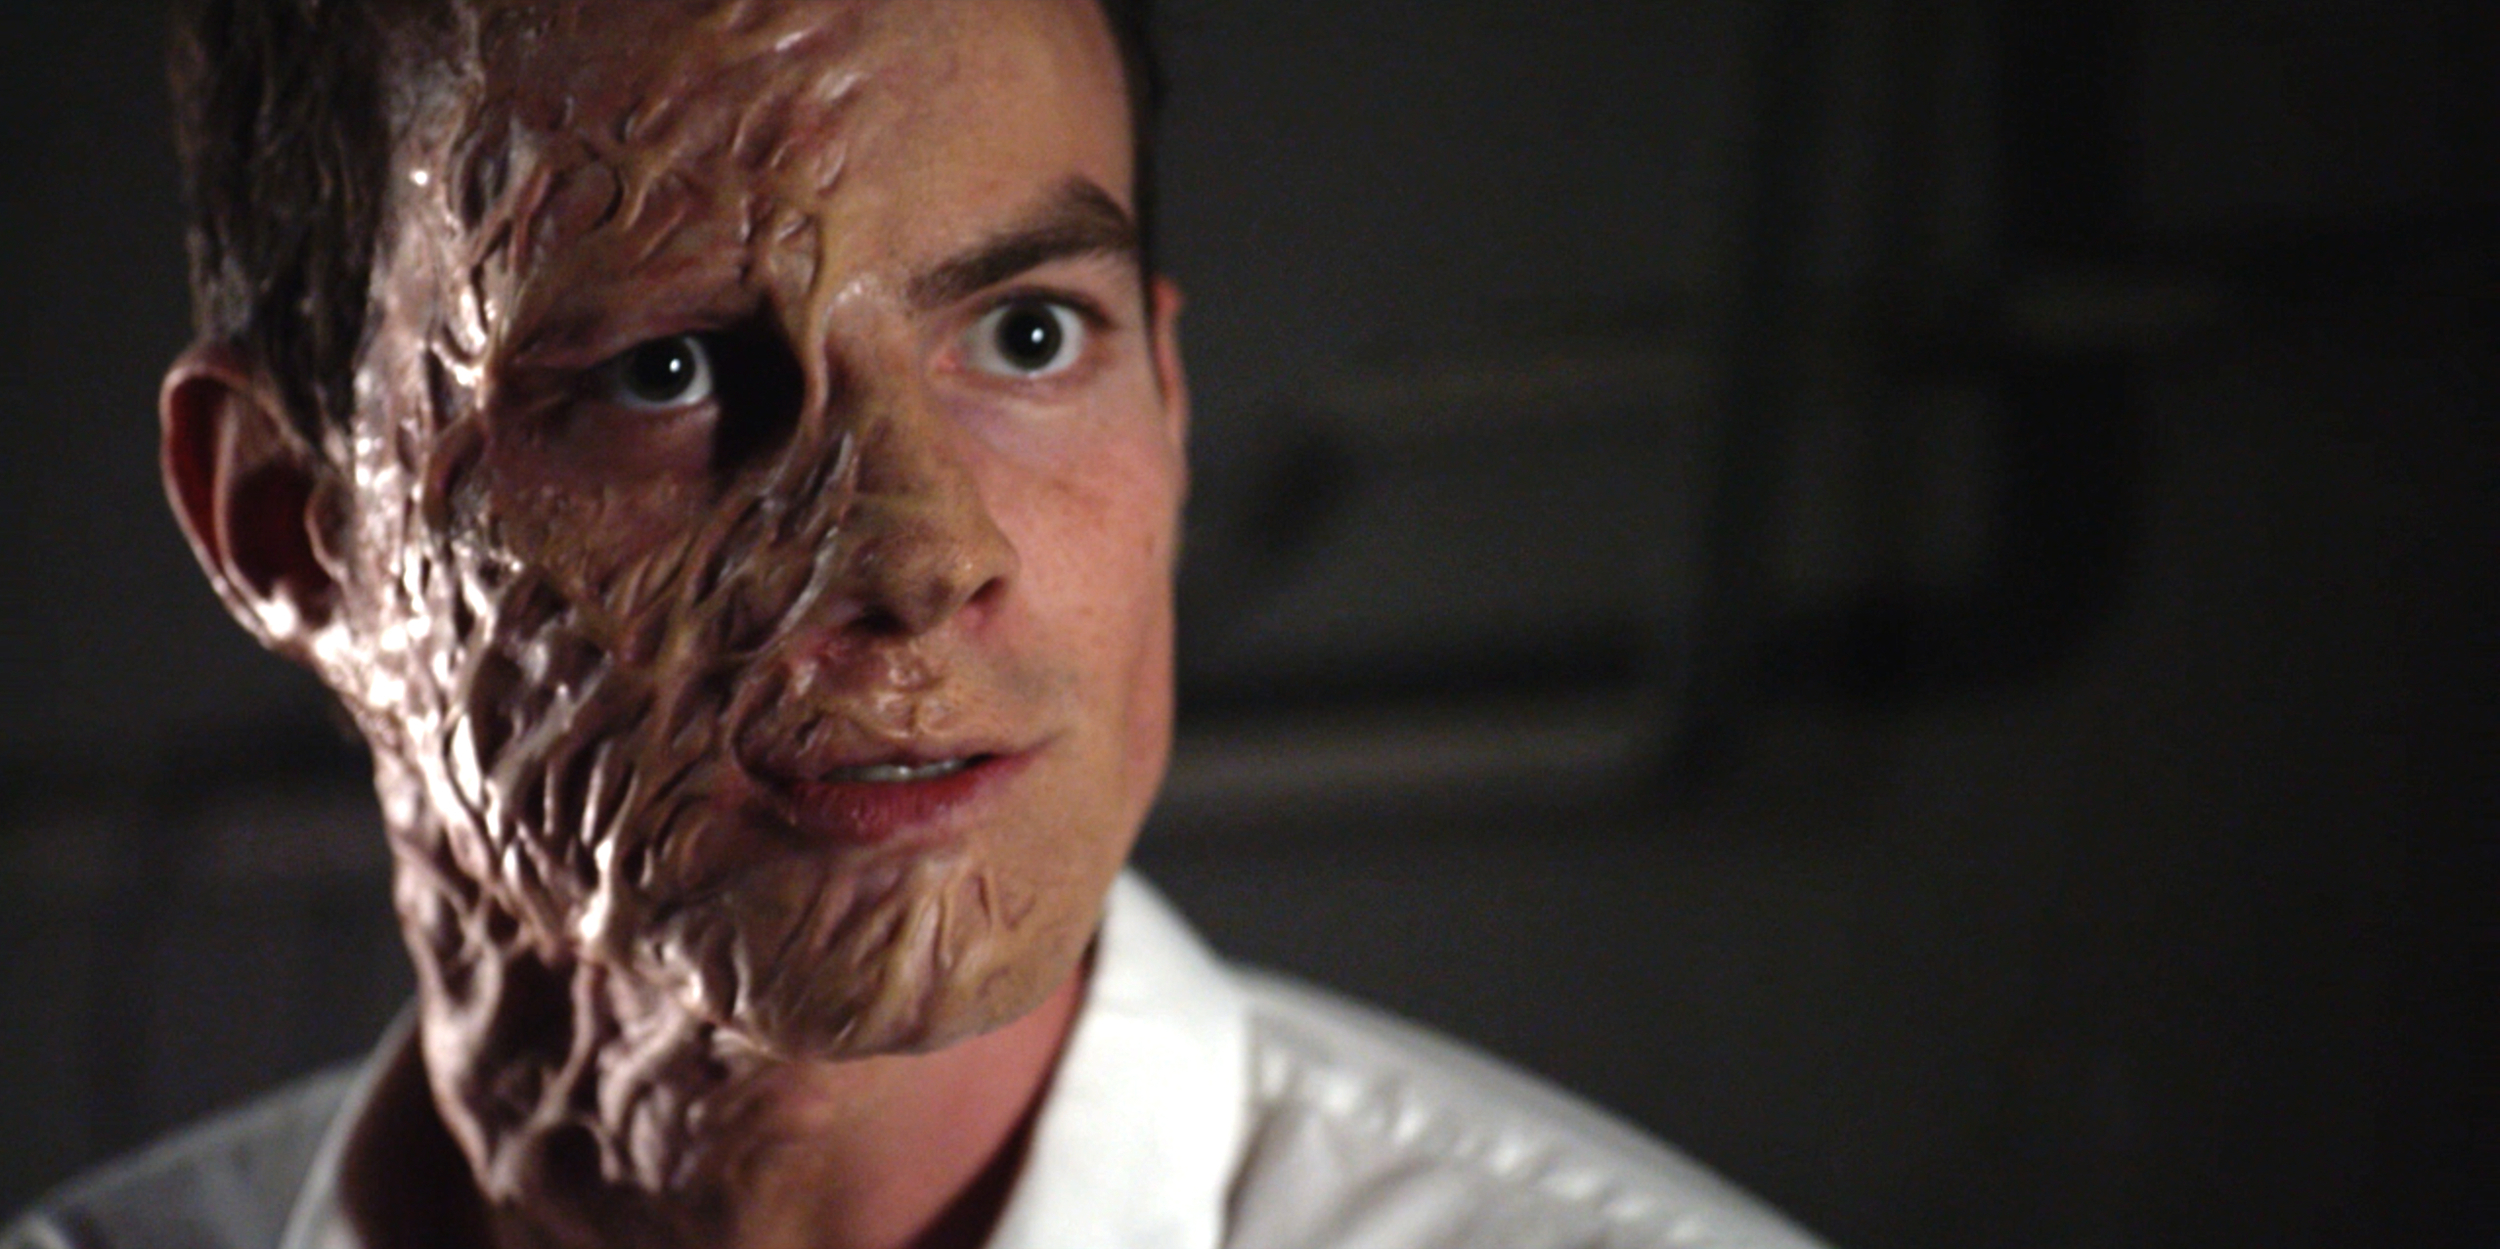 Luke Cook in Intricate Vengeance